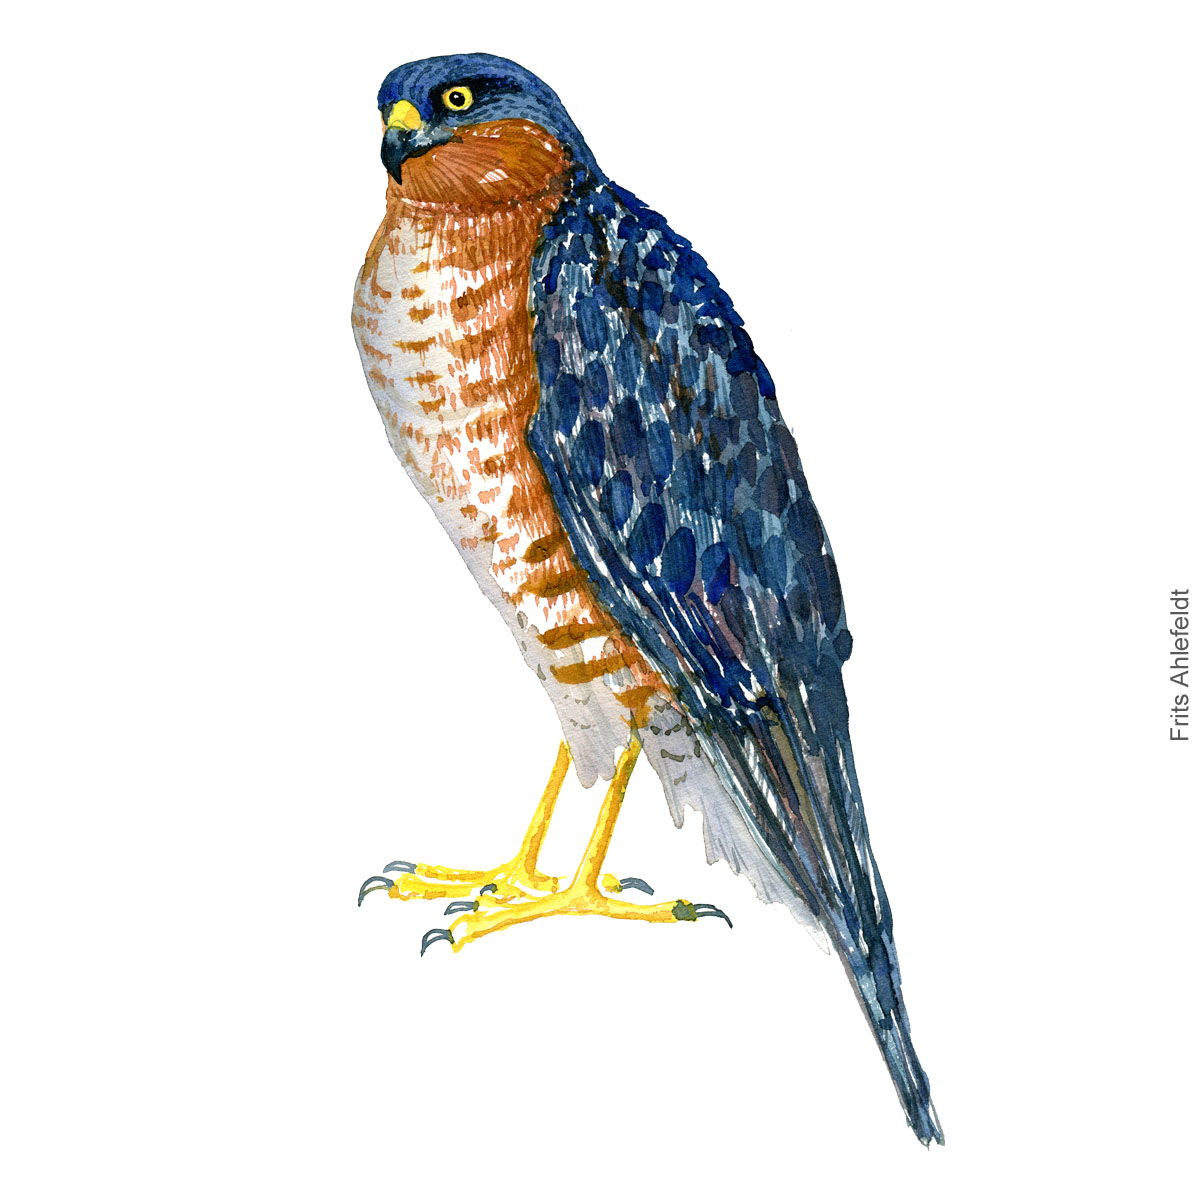 Erurasian sparrow hawk spurvehoeg Akvarel. Watercolor bird illustration by Frits Ahlefeldt